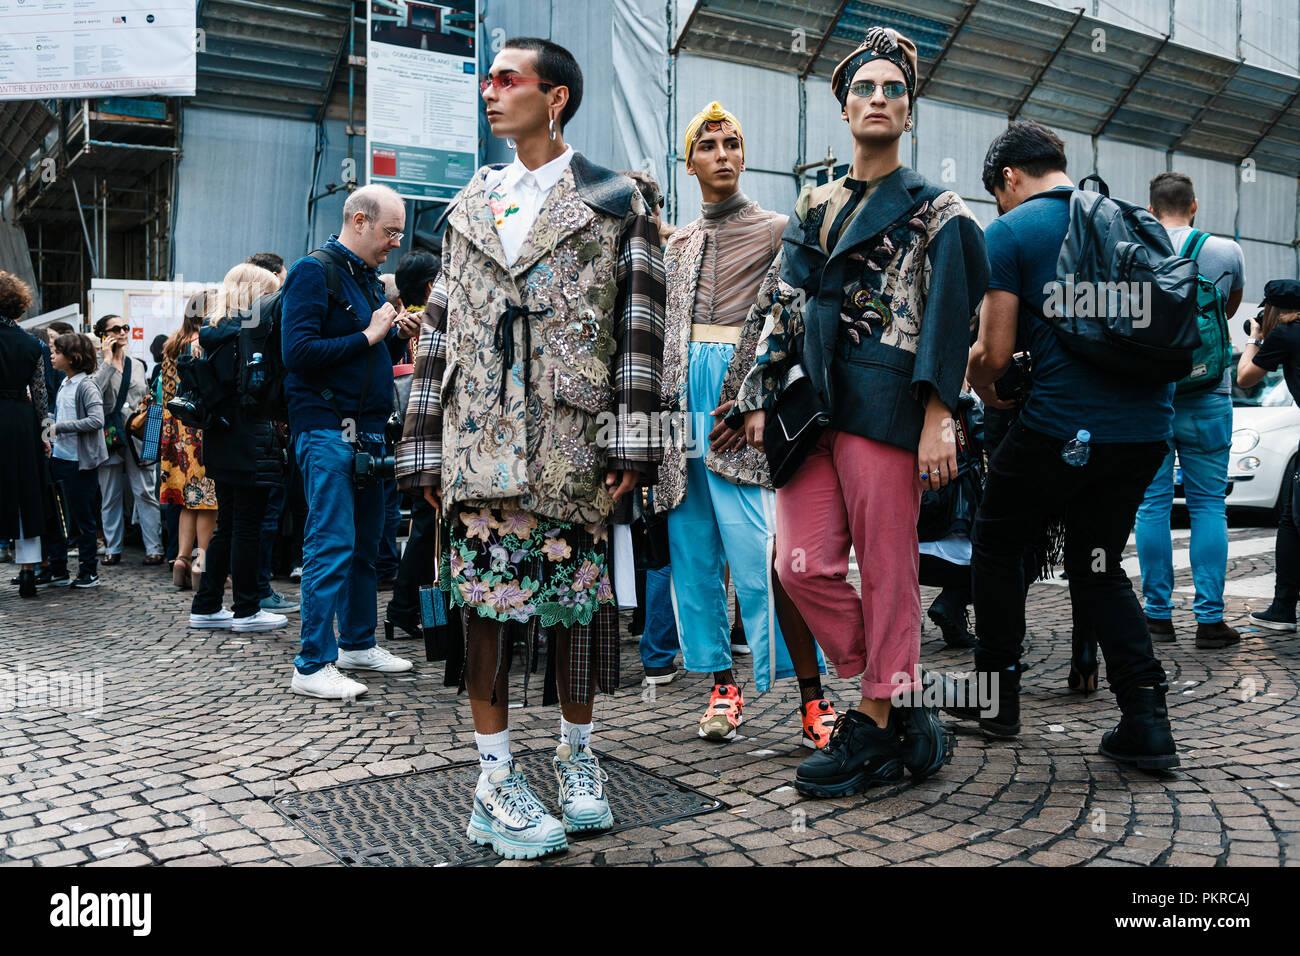 MILAN, ITALY - SEPTEMBER 23, 2017: Outside ANTONIO MARRAS Show at Milan Fashion Week Spring/Summer 2018 - Stock Image